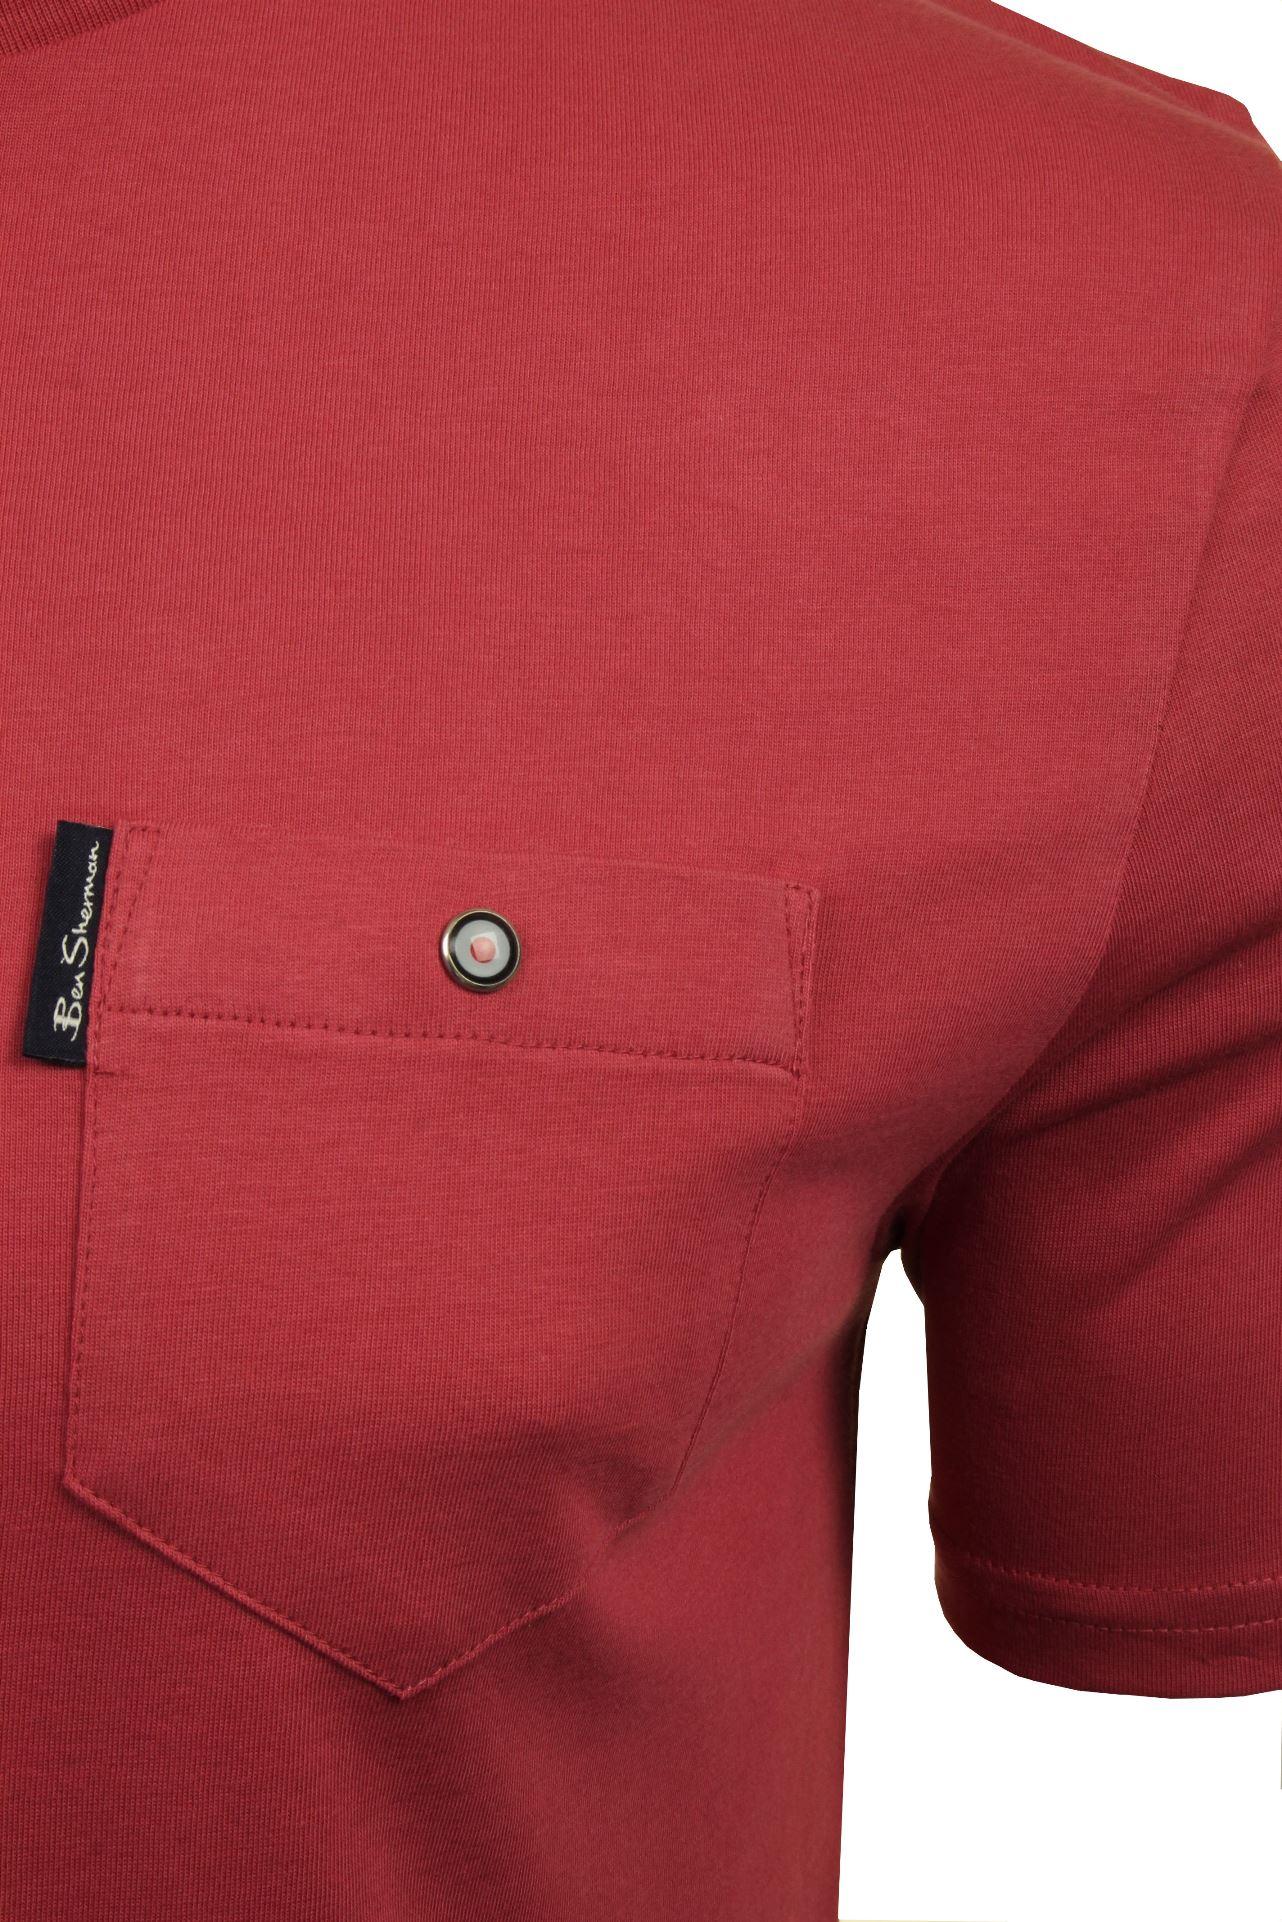 Mens-Classic-Spade-Pocket-T-Shirt-by-Ben-Sherman thumbnail 30